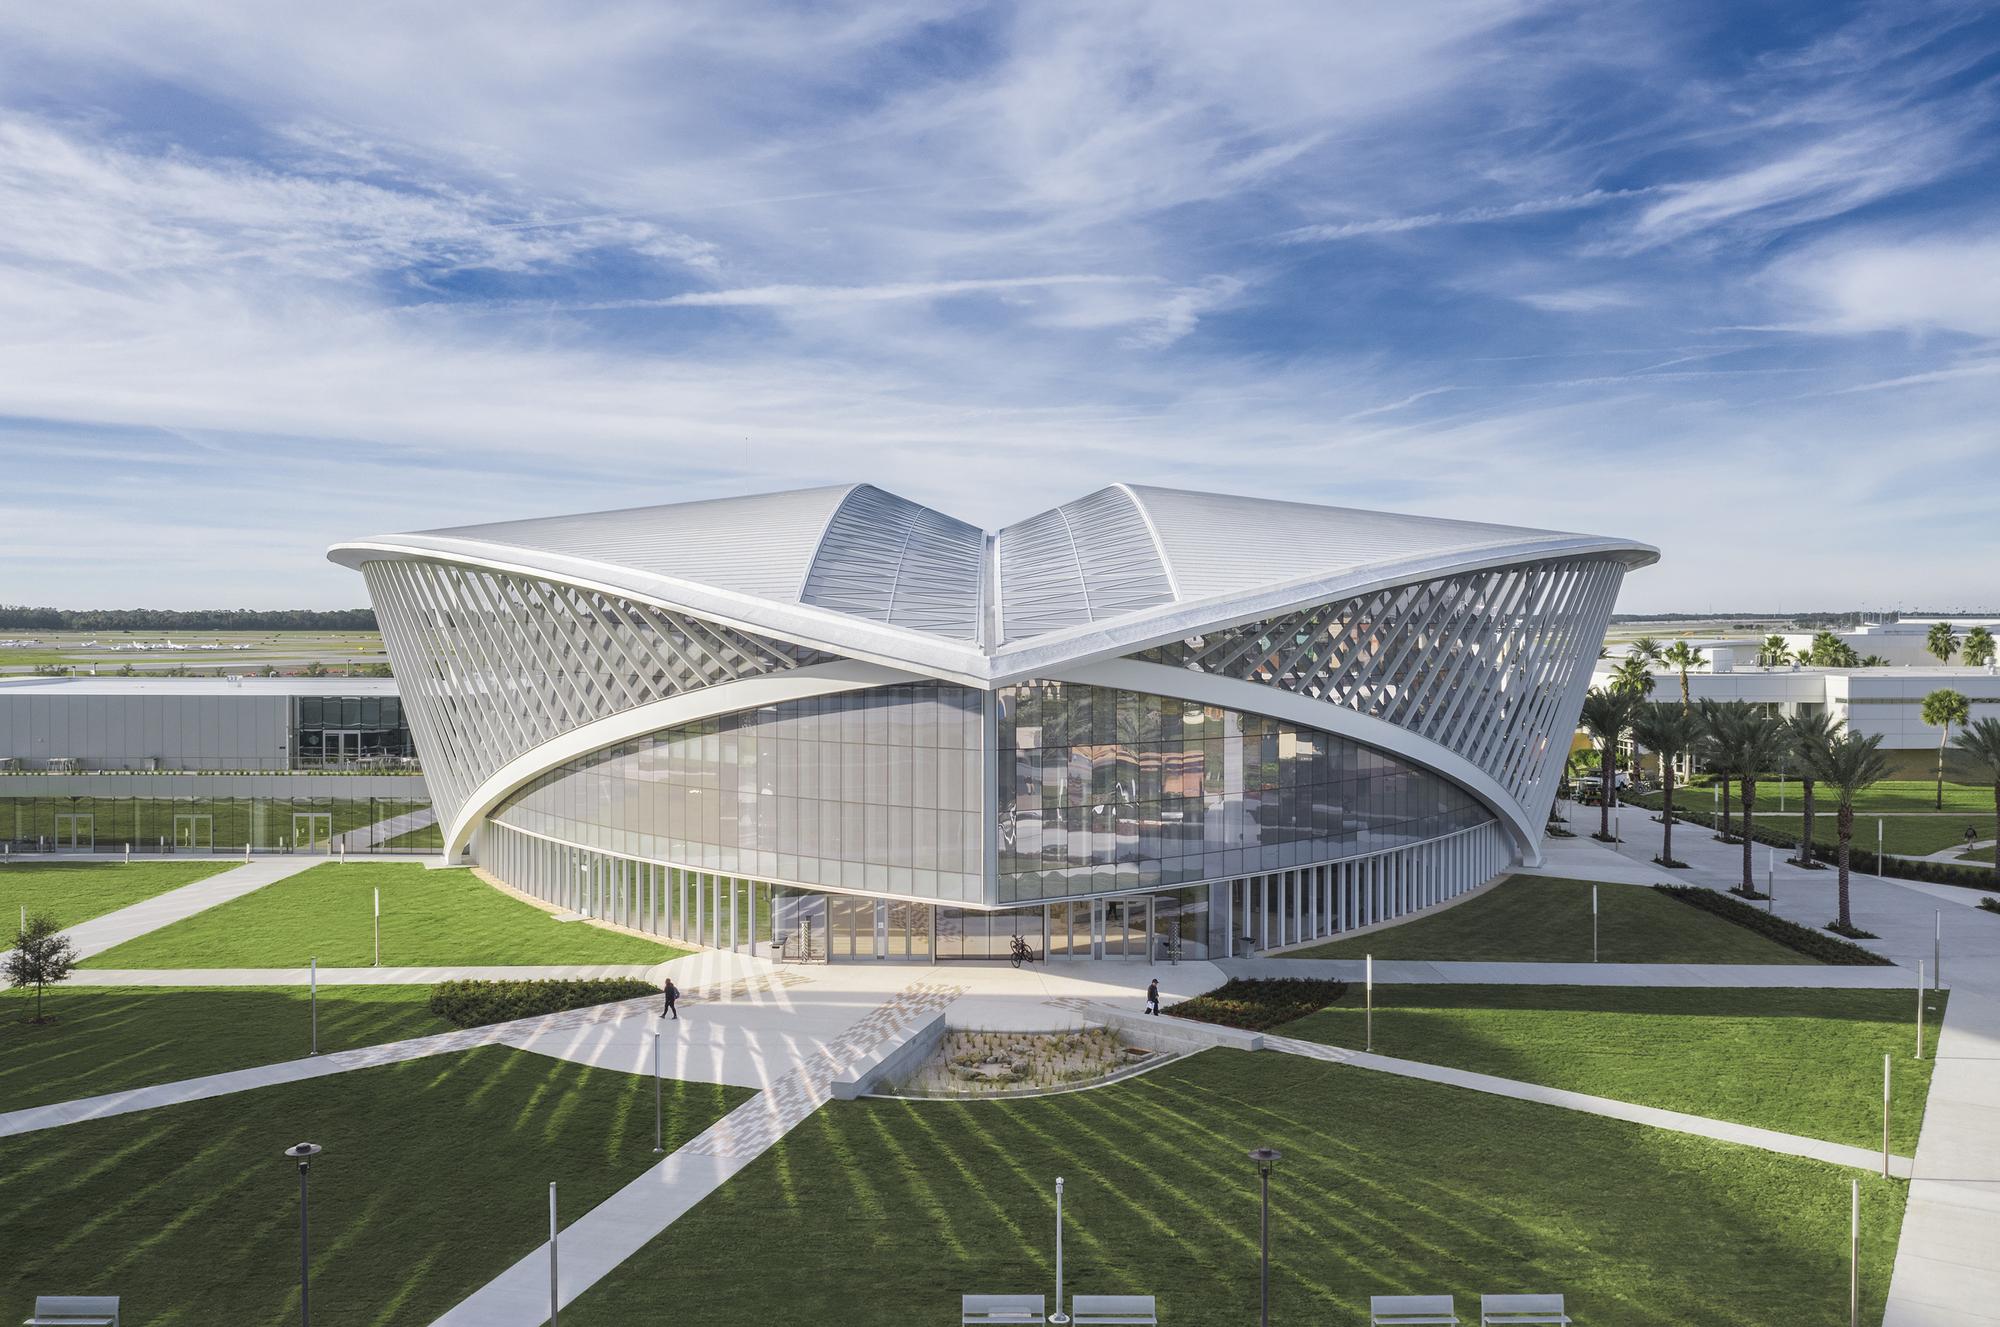 Mori Hosseini Student Union at Embry-Riddle Aeronautical University / ikon.5 architects